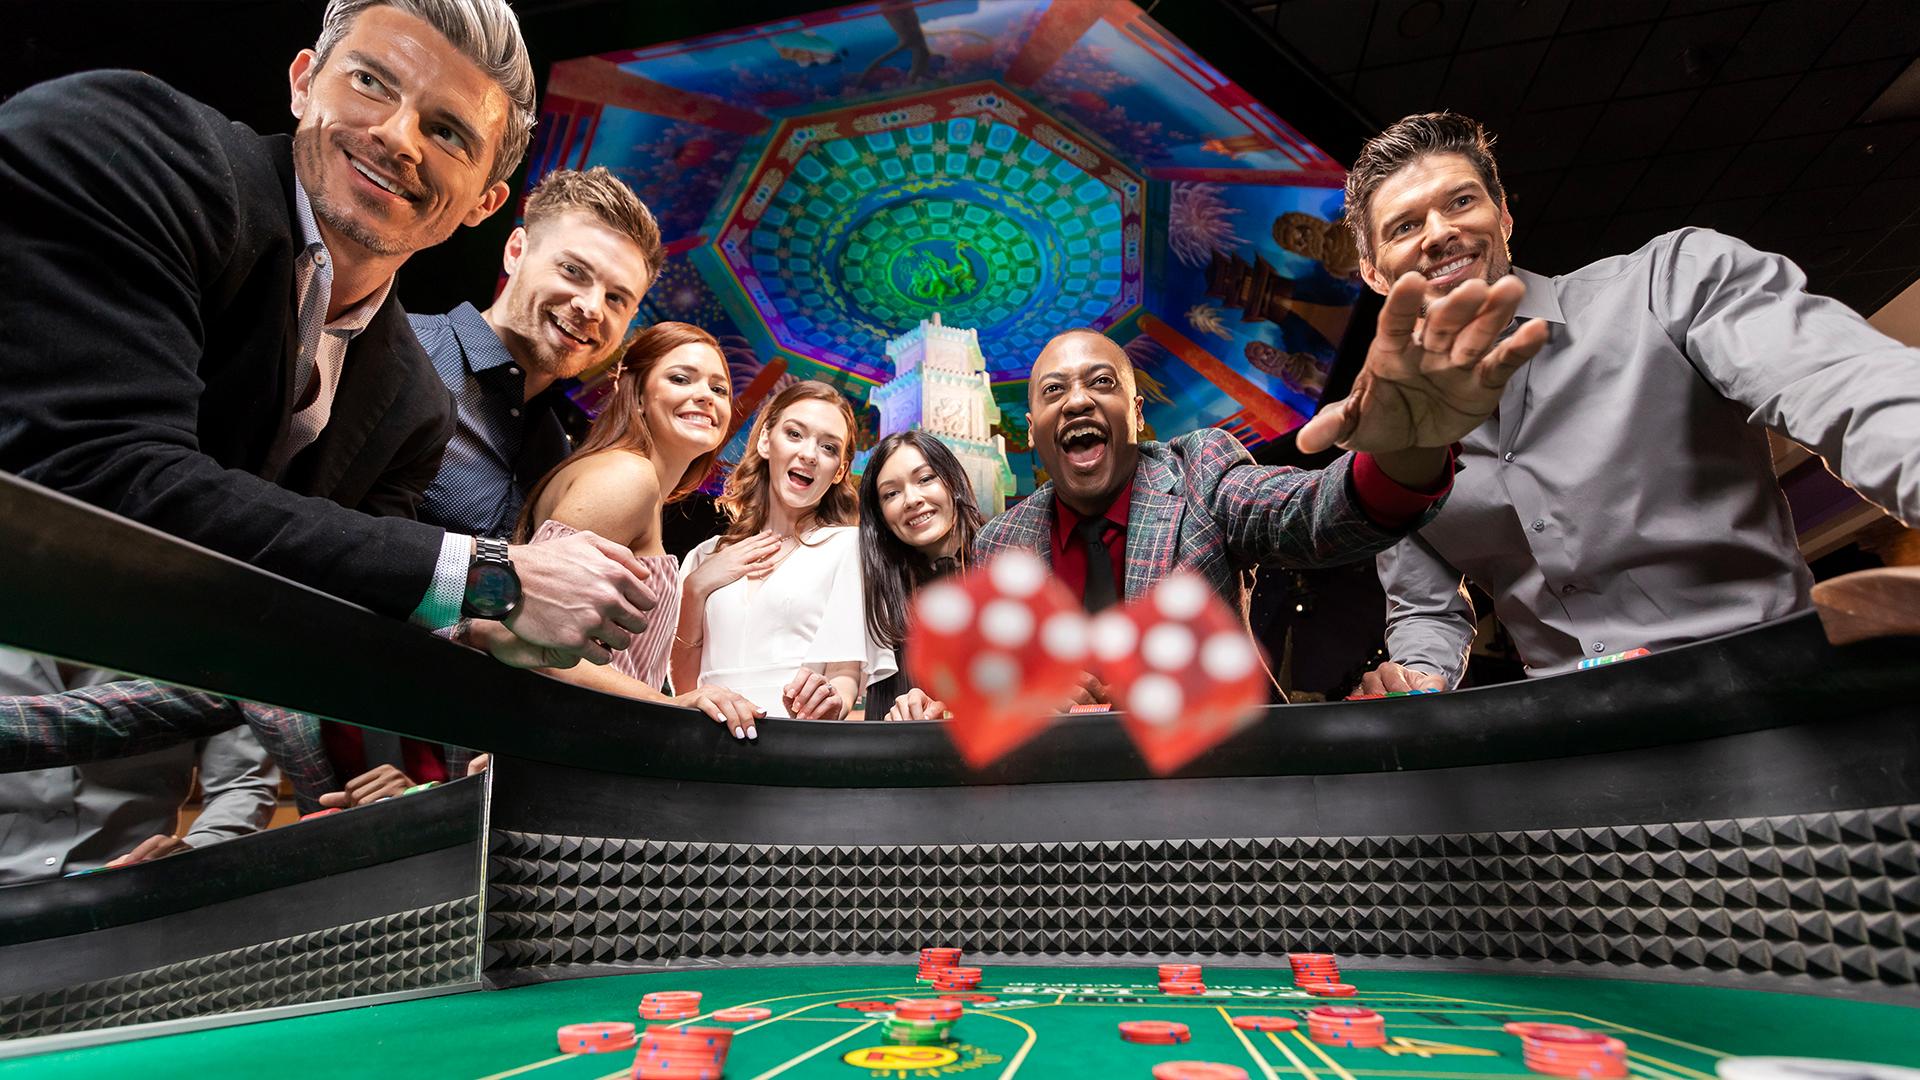 Powerful PBN Pyramids Poker/Casino/Gambling Sites SEO Backlinks Package 2020 V2